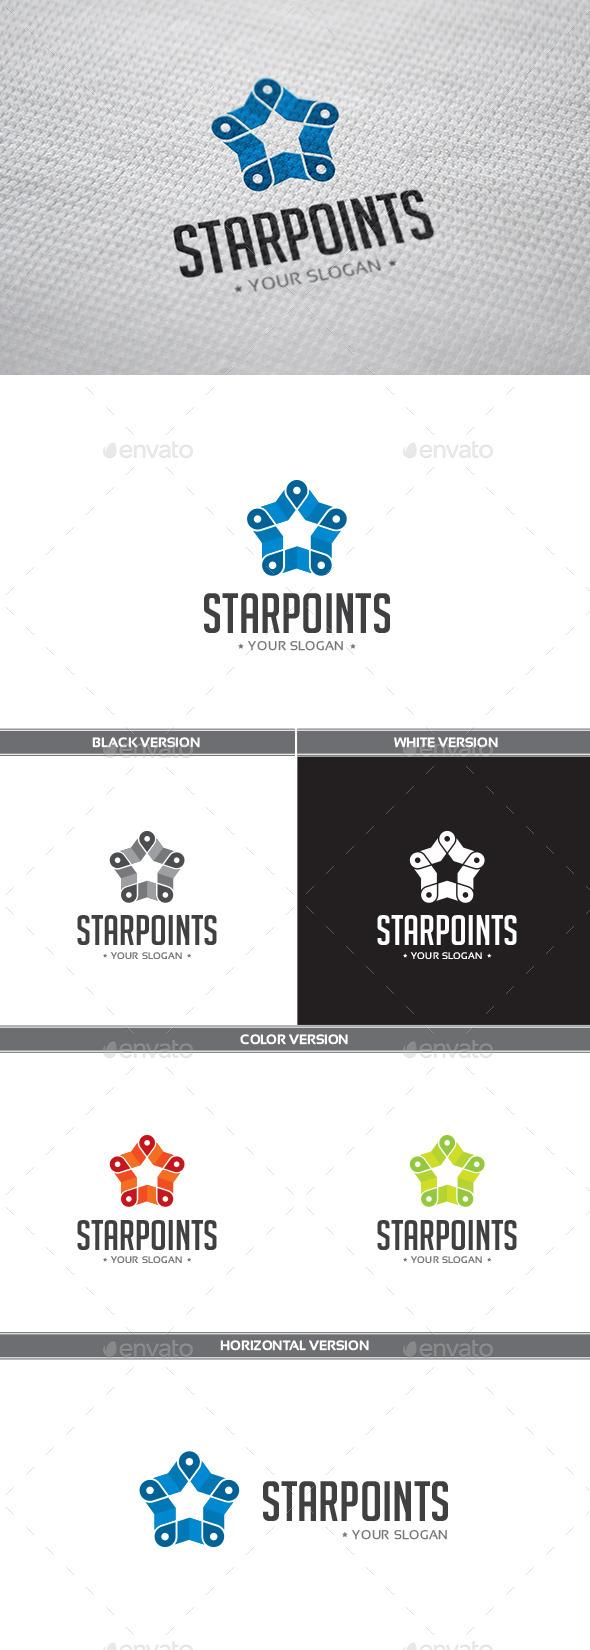 GraphicRiver Starpoints Logo 9895221